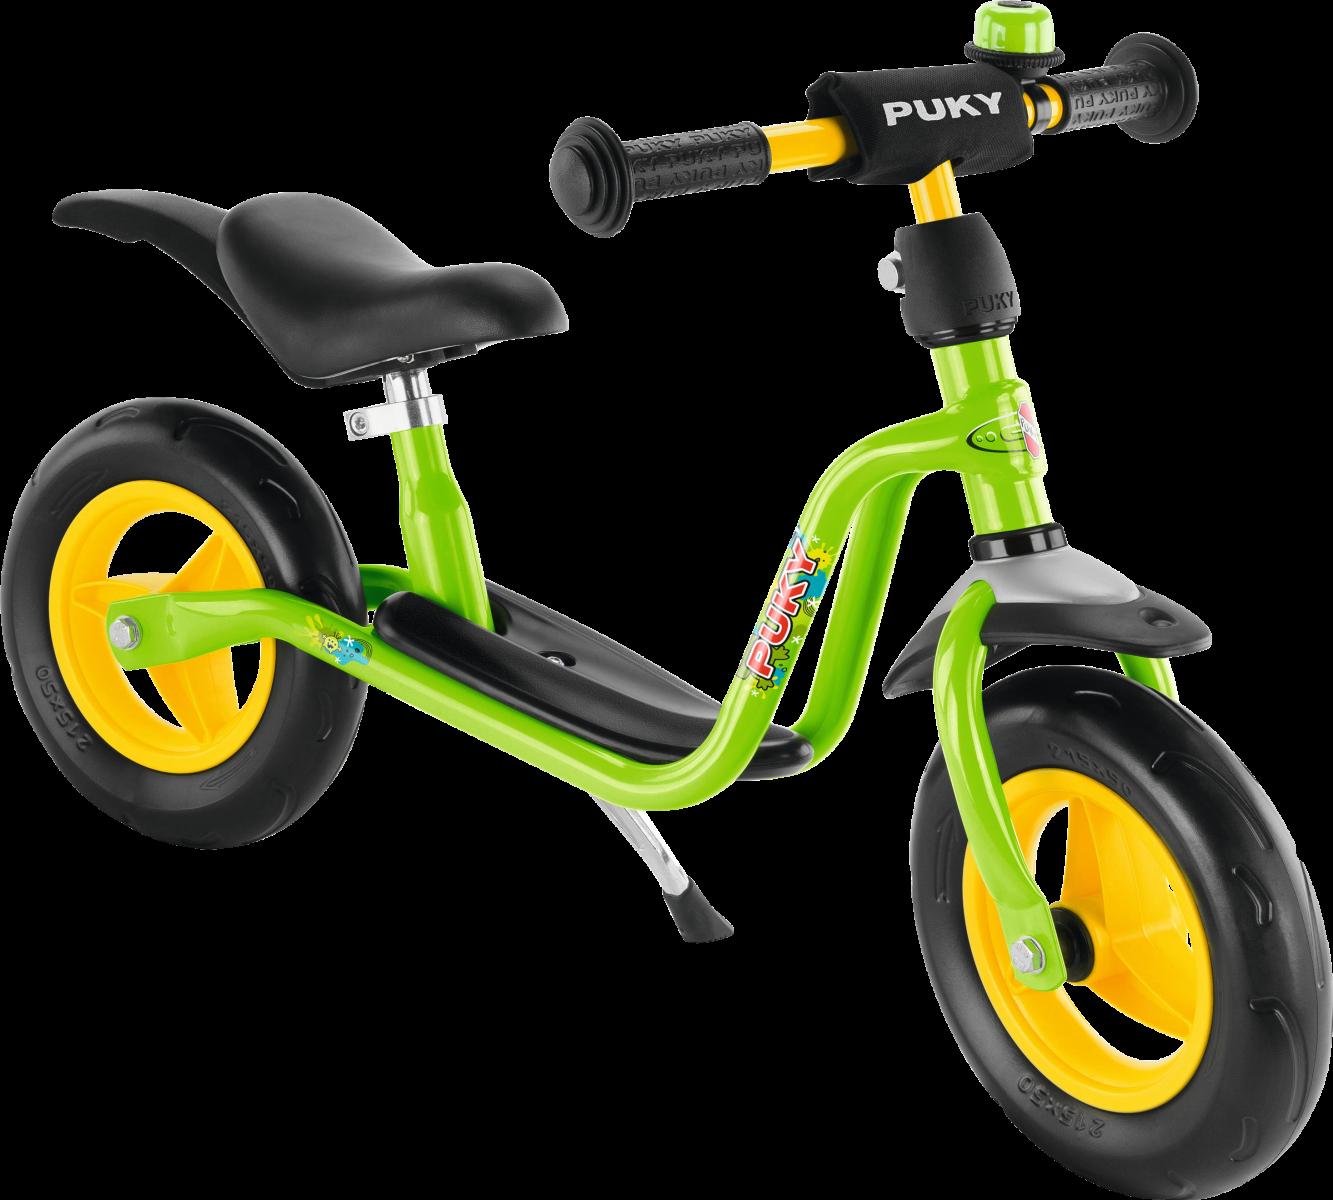 Puky LR M PLUS Løbecykel - Grøn